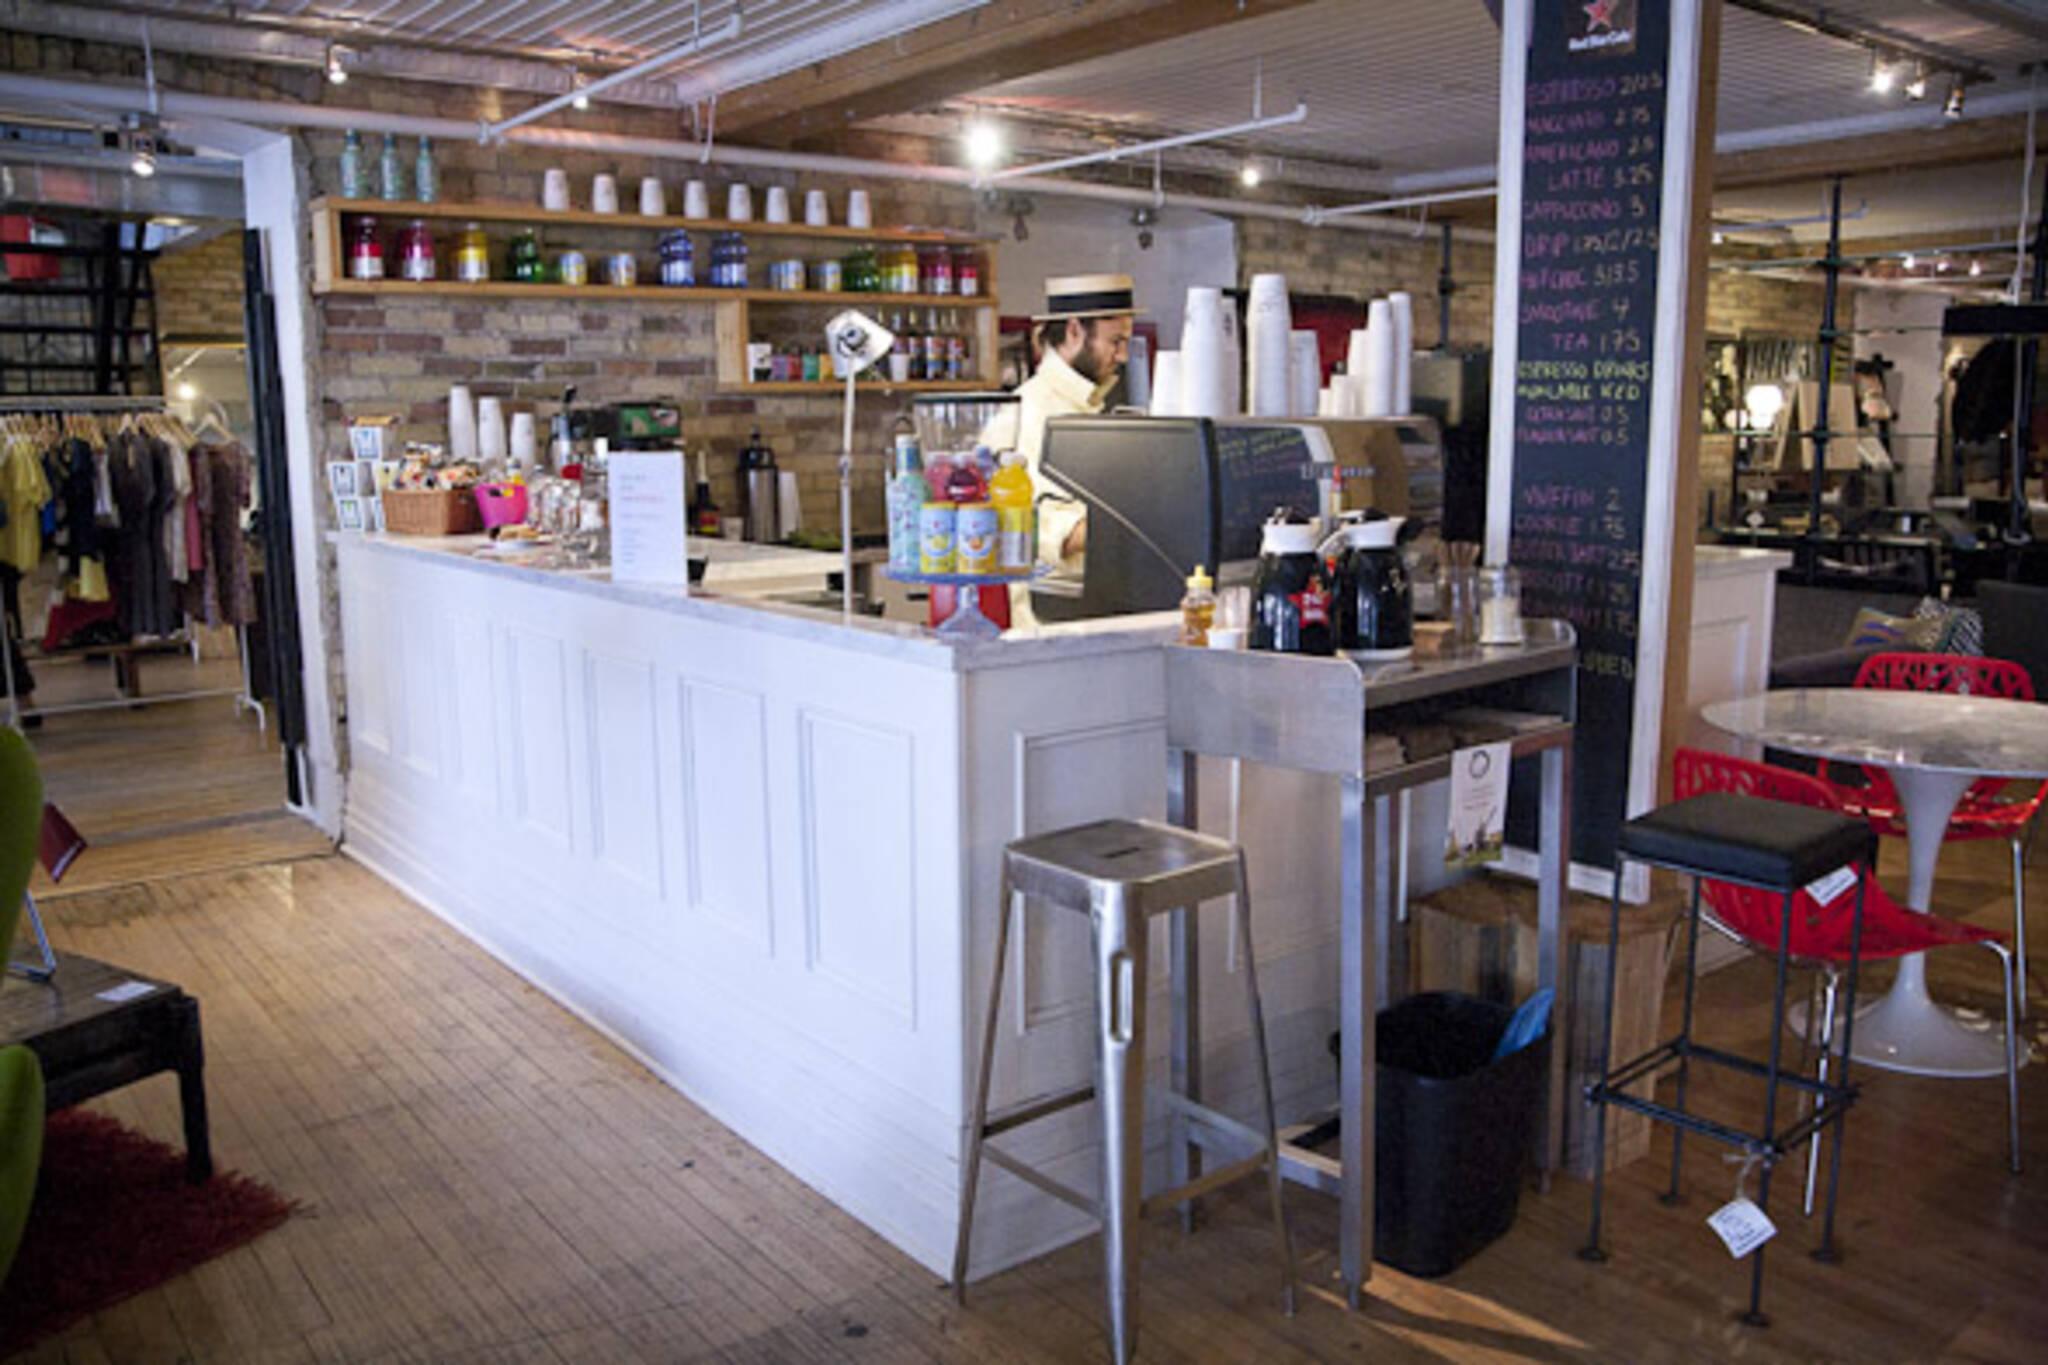 burroughes Cafe